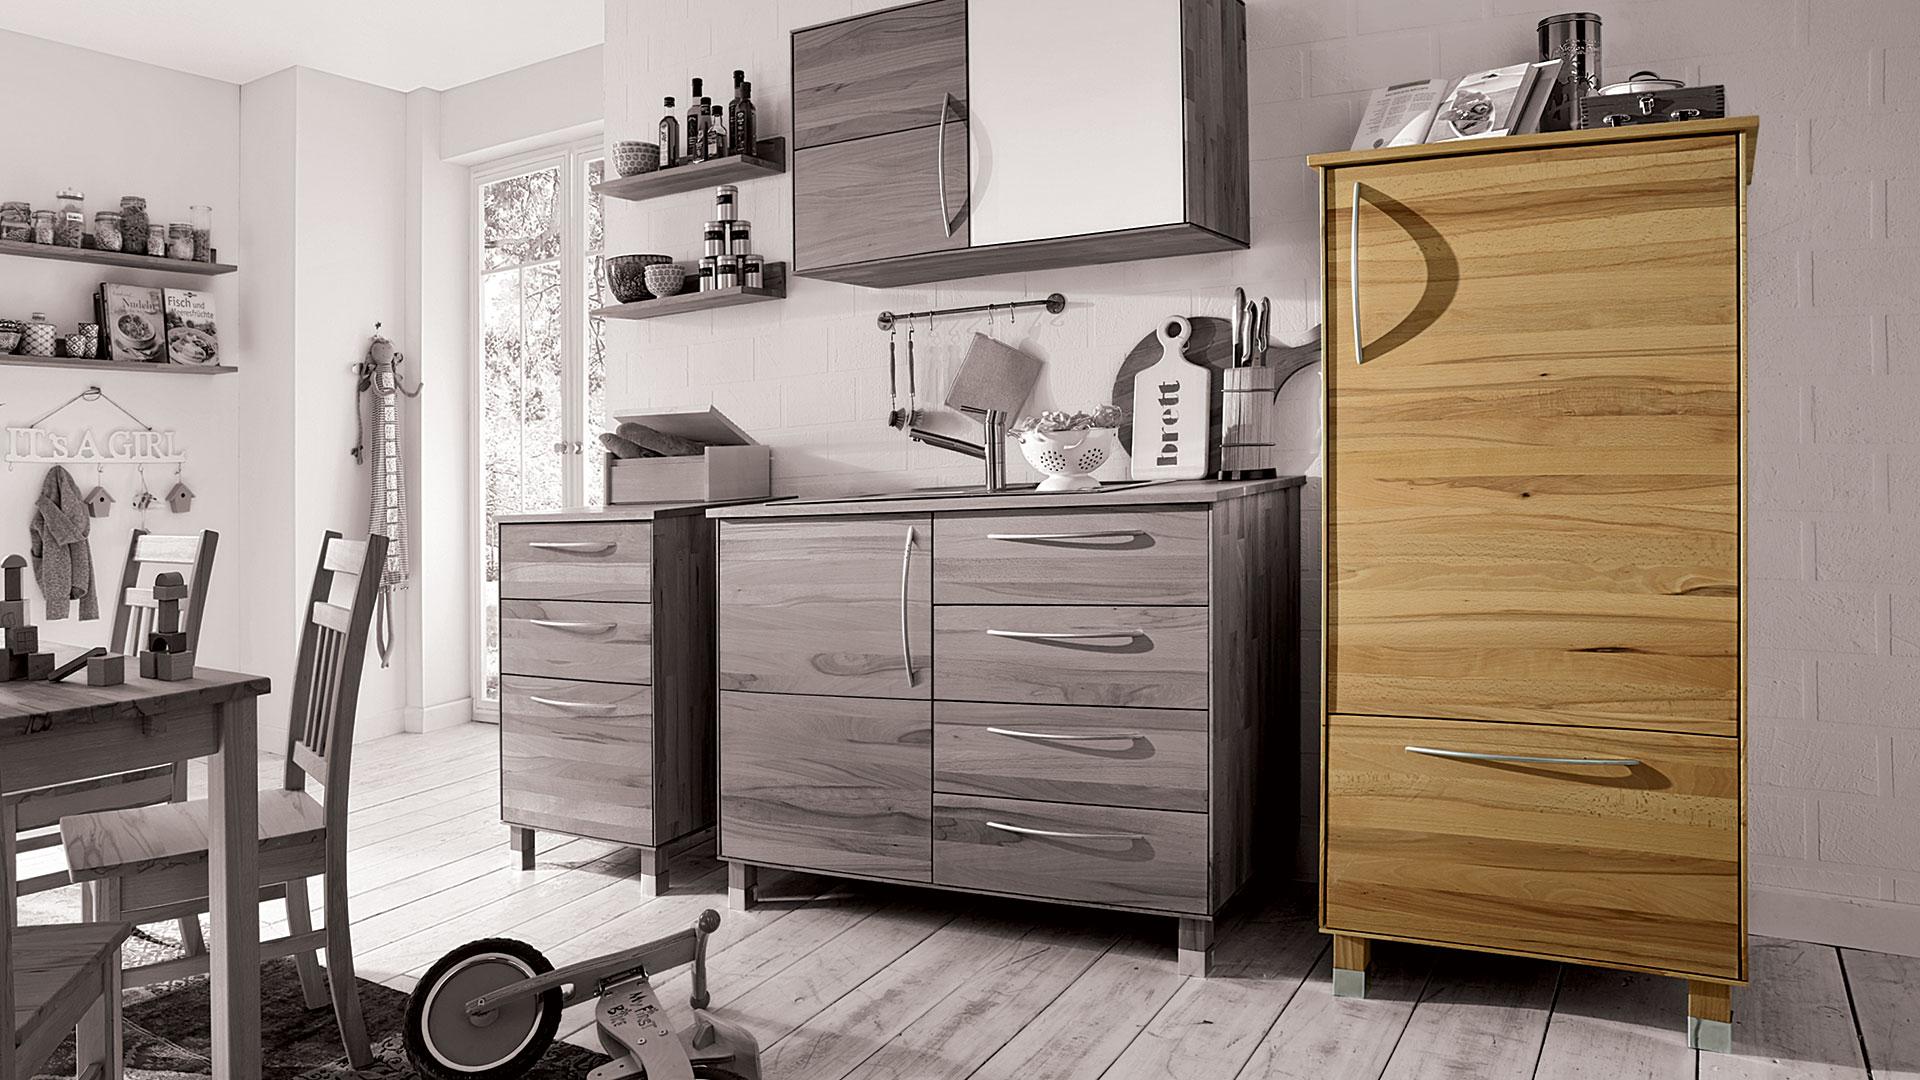 k chen vorratsschrank culinara 100 massivholz. Black Bedroom Furniture Sets. Home Design Ideas